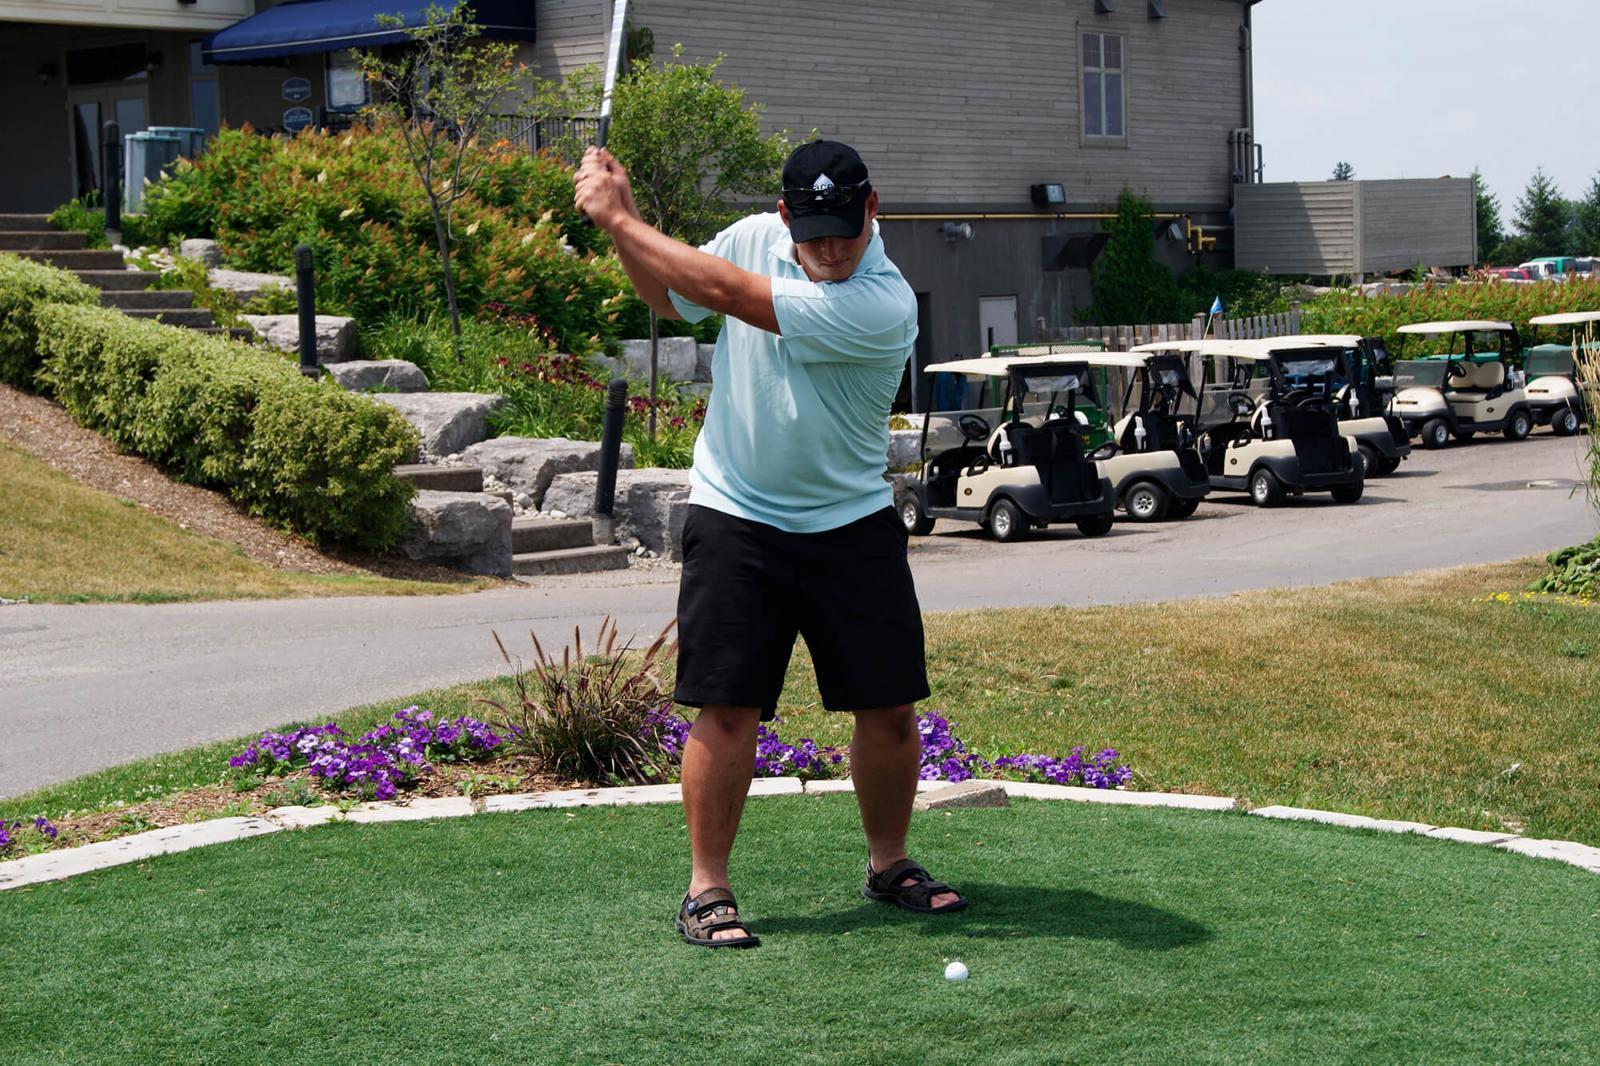 Landscape Ontario's golf season is well underway